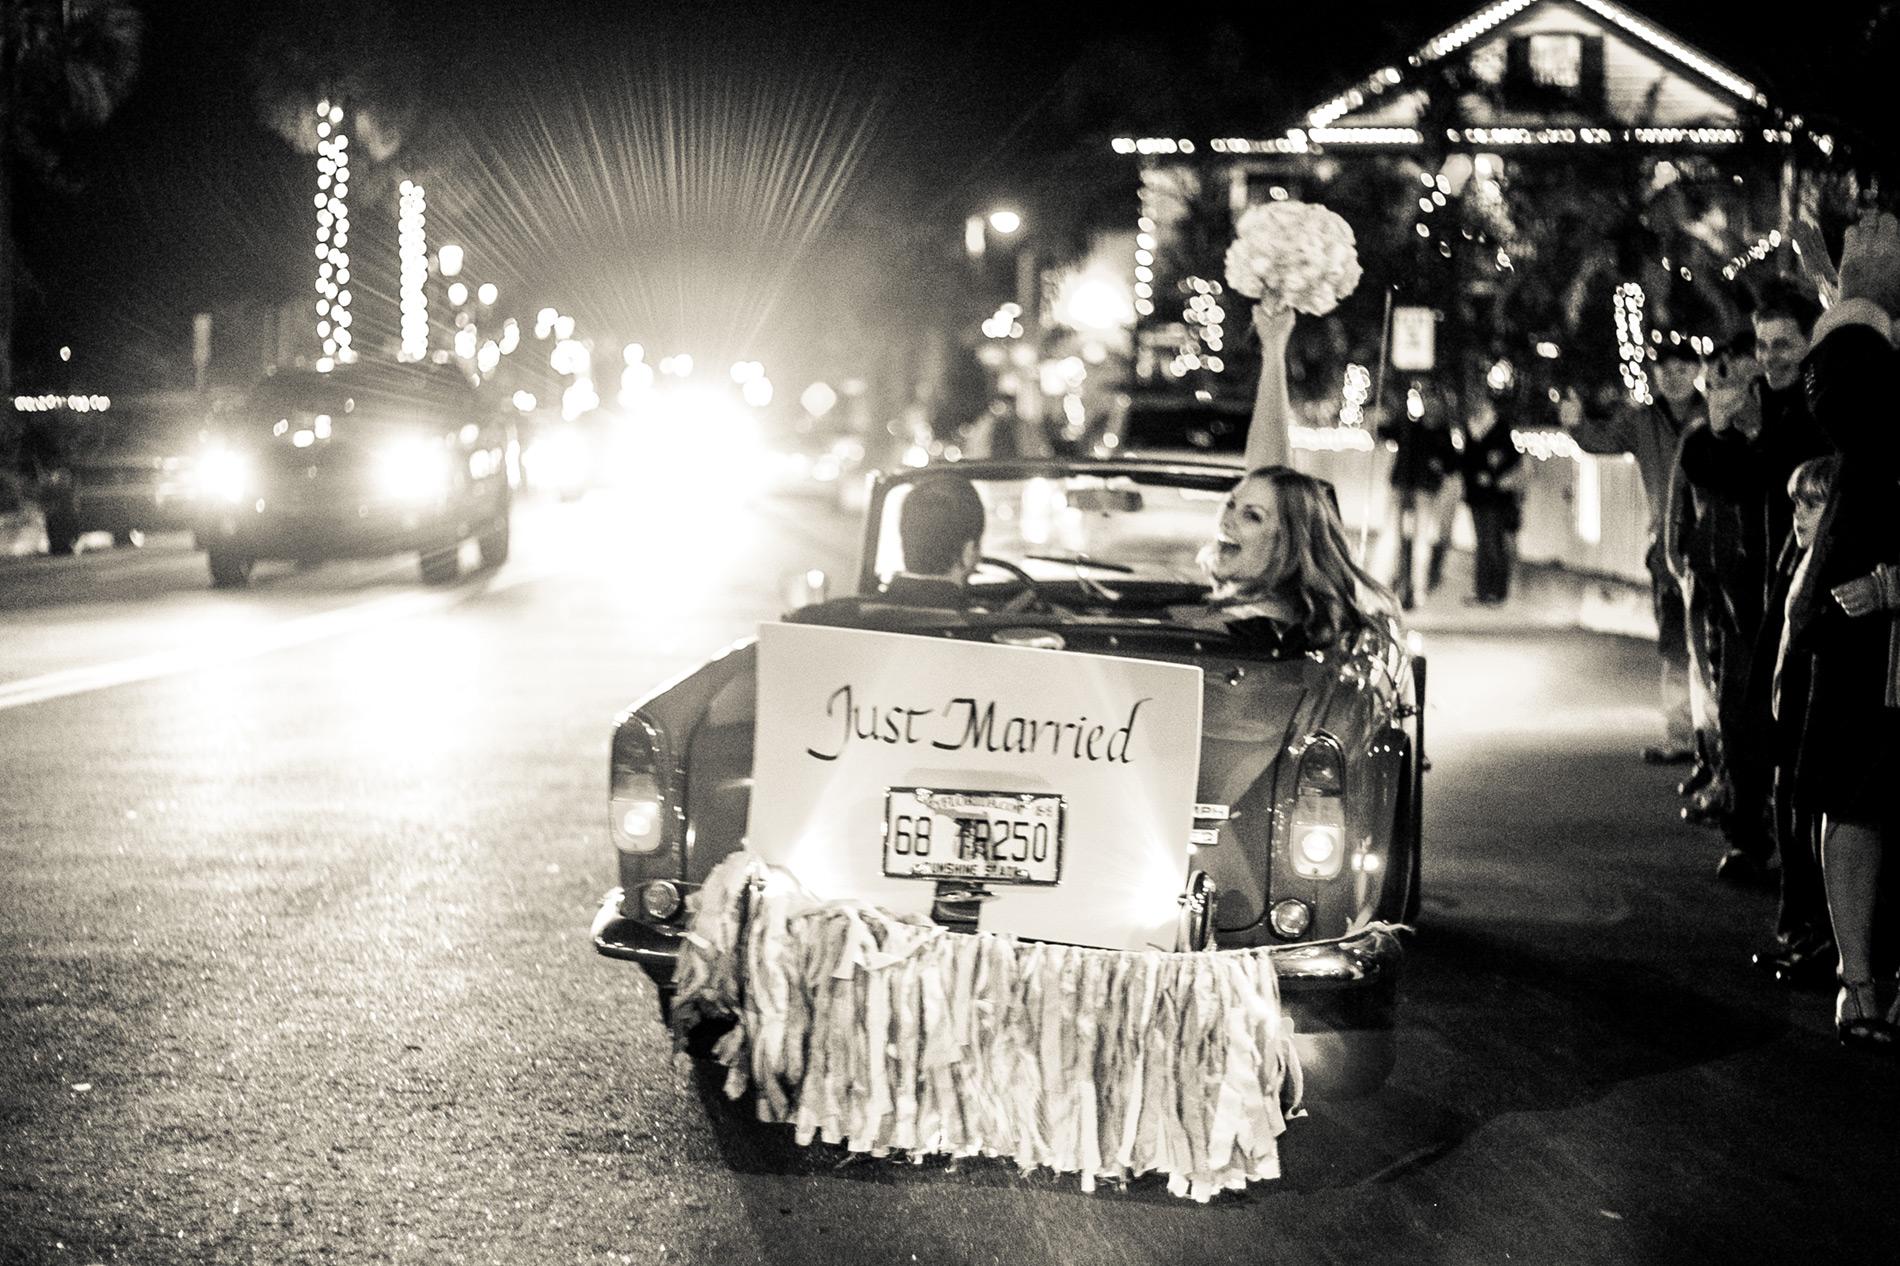 St-Augustine-Wedding-Venues-White-Room-Wedding-getaway-car